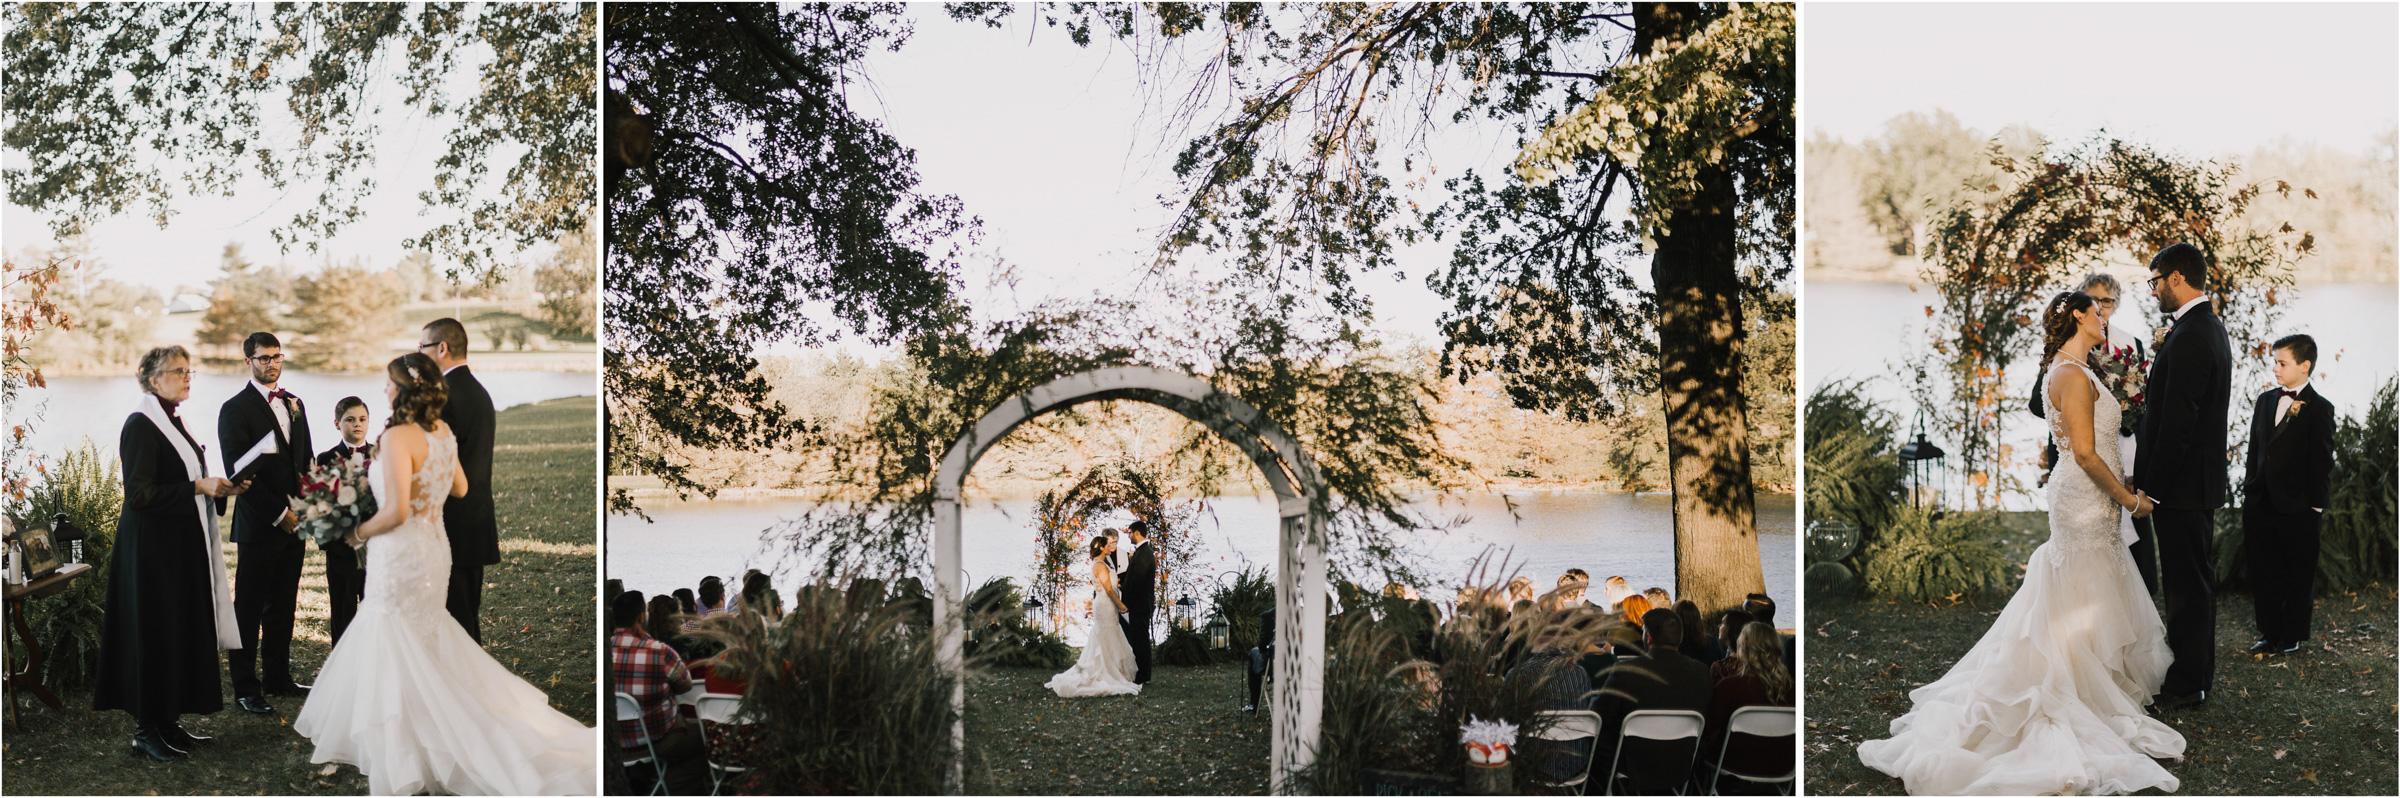 alyssa barletter photography intimate fall autumn wedding rural missouri wedding photographer-29.jpg